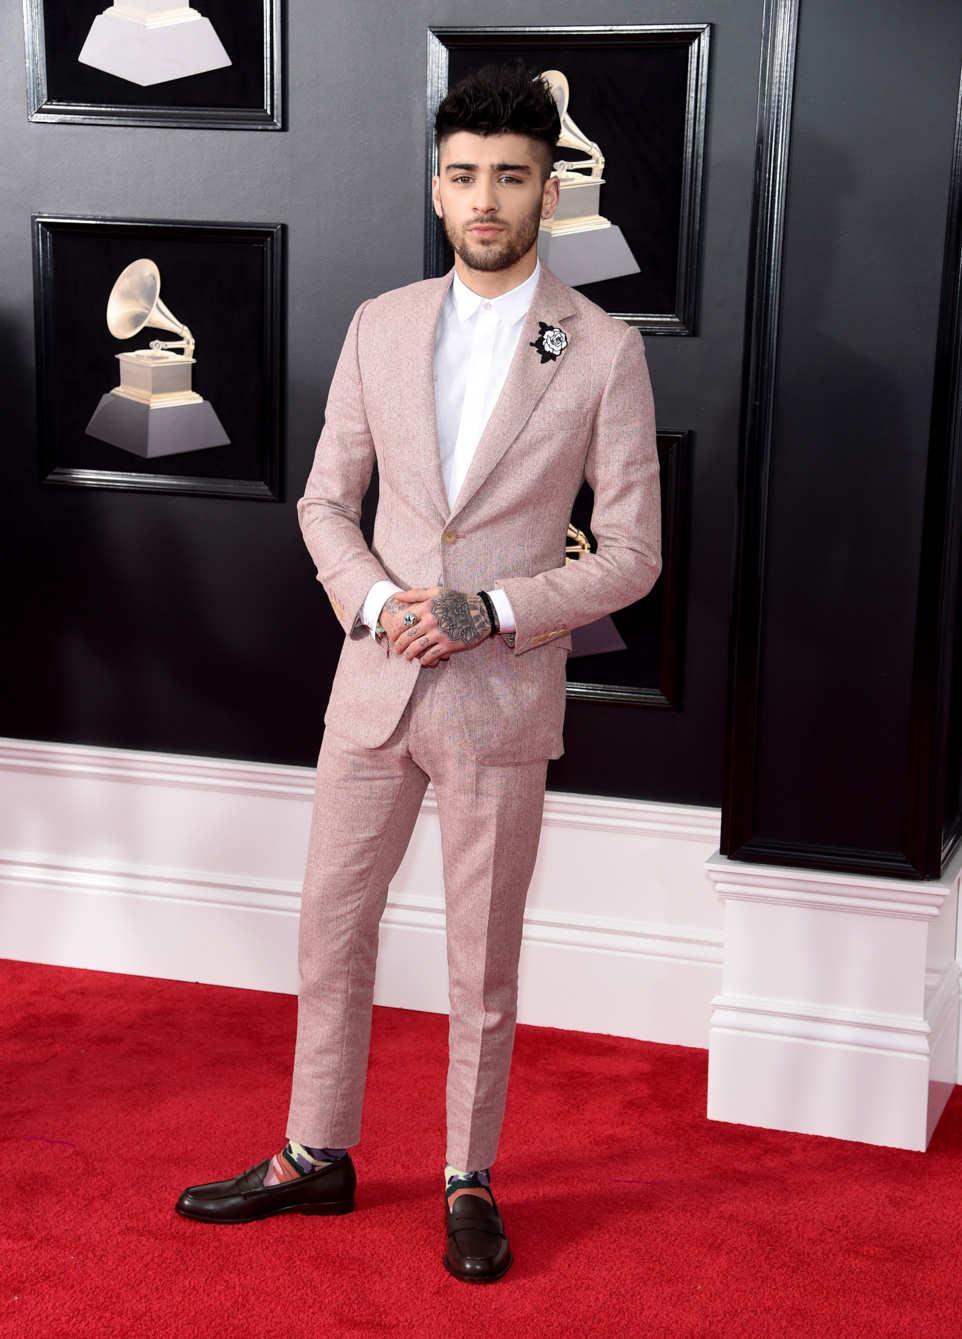 Grammys Awards 2018 - Zayn Malik in Richard James .jpg